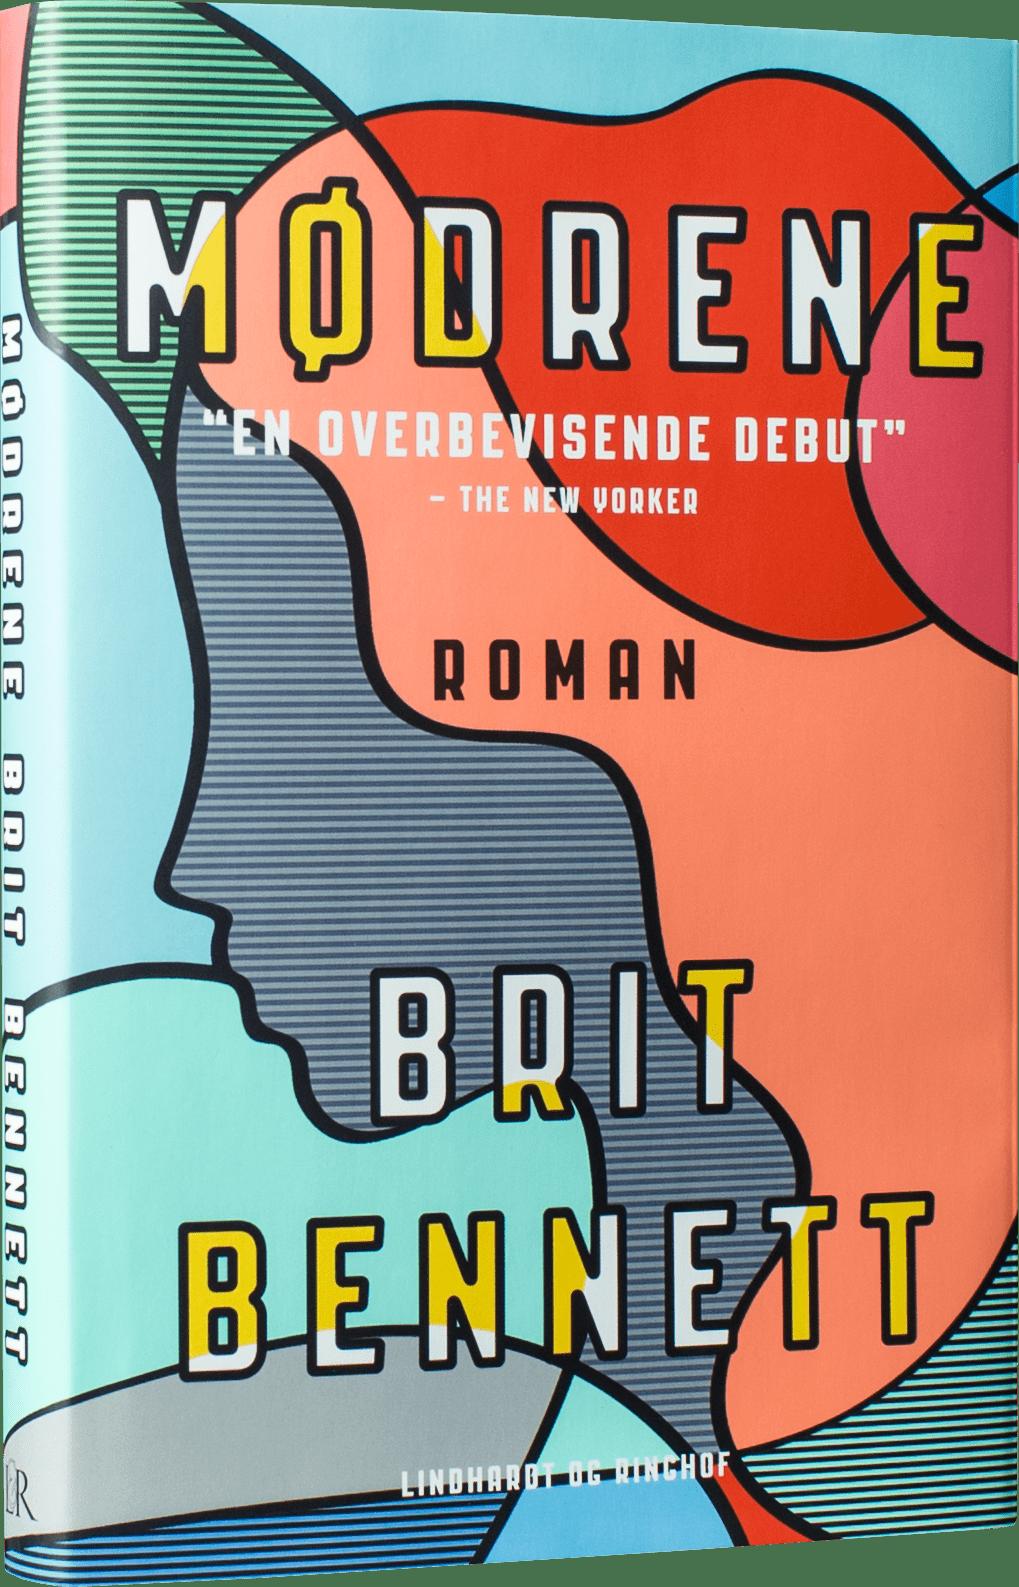 Mødrene, Brit Bennett, amerikansk roman, kærlighedsroman, ungdom, venskab